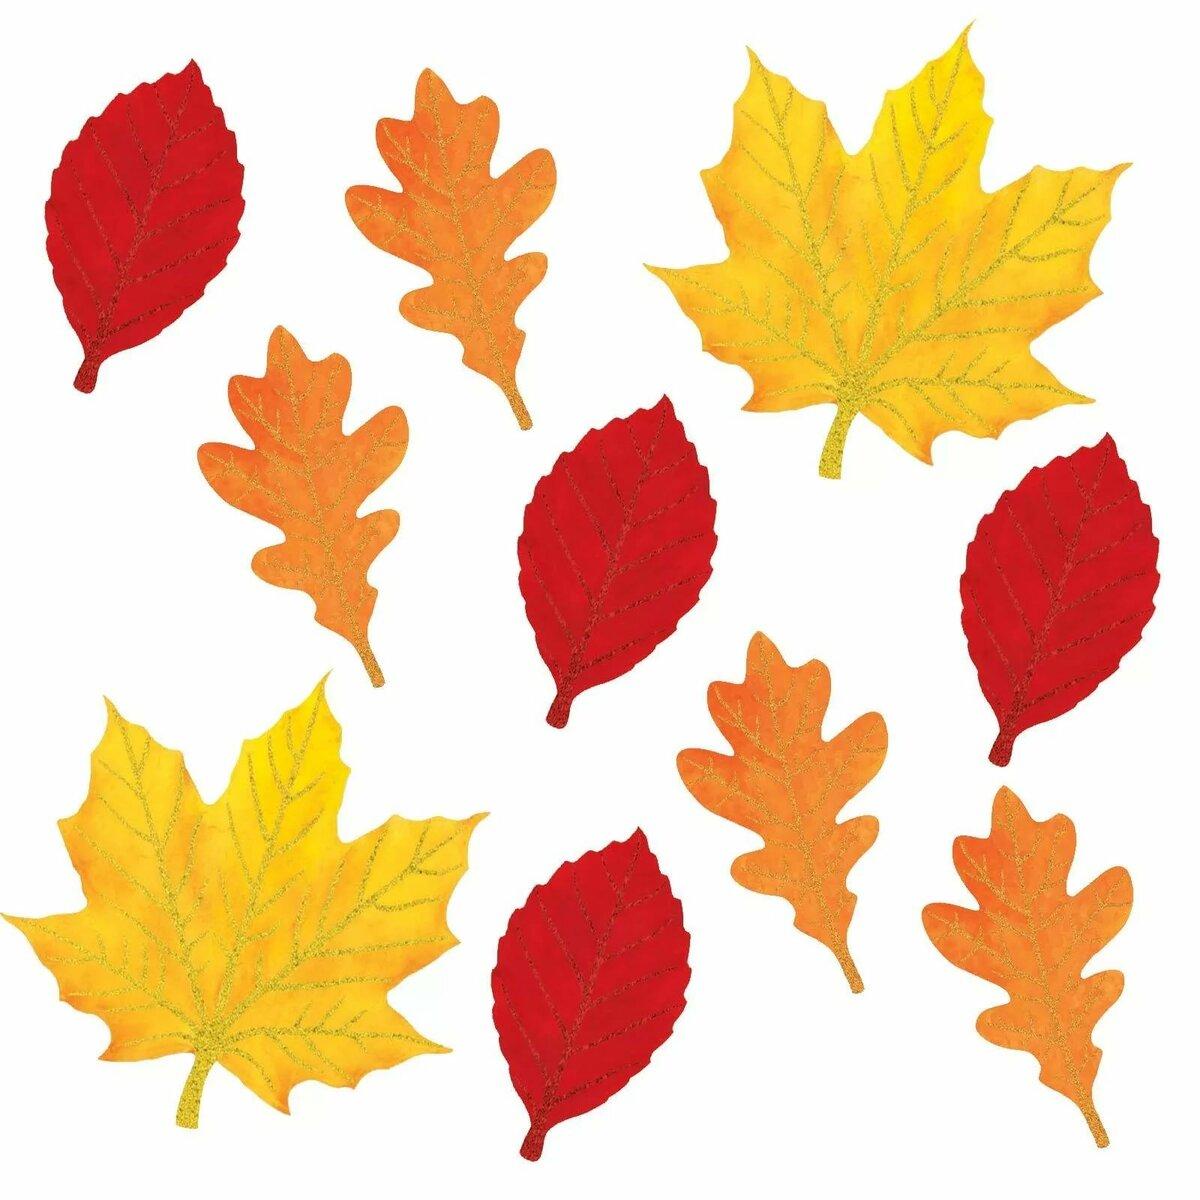 маленькие картинки листьев хейгл